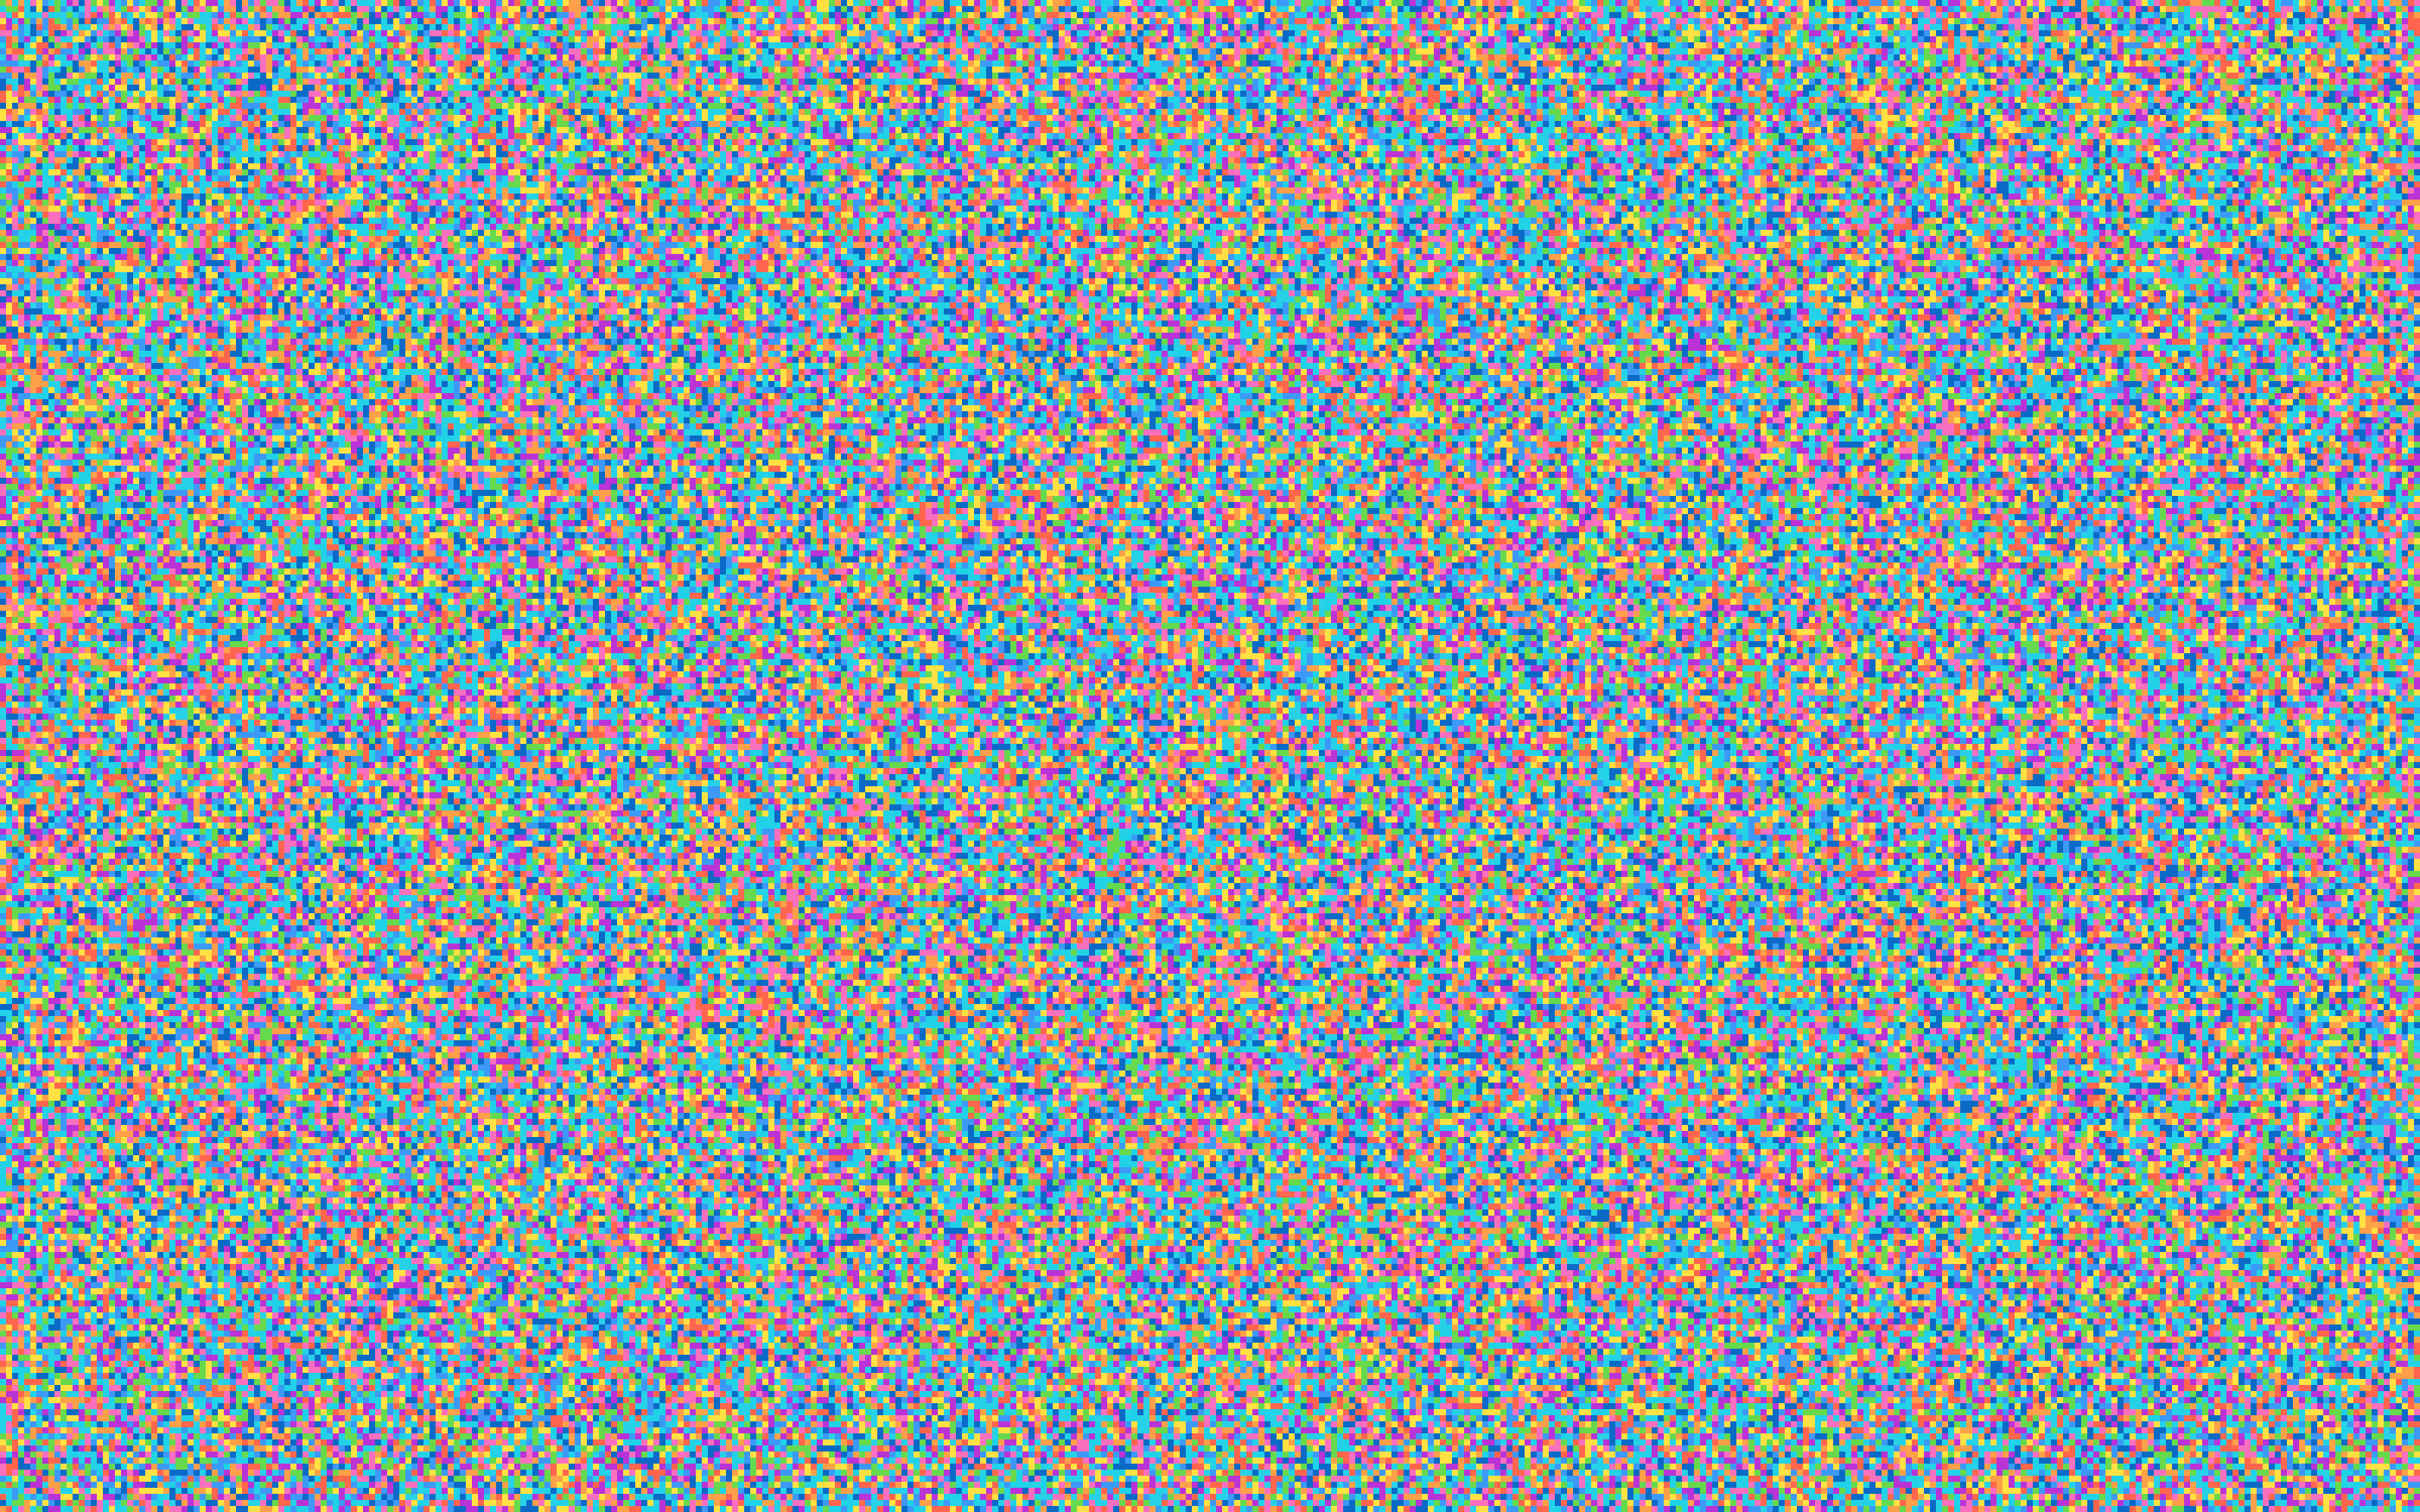 100,000 digits of pi